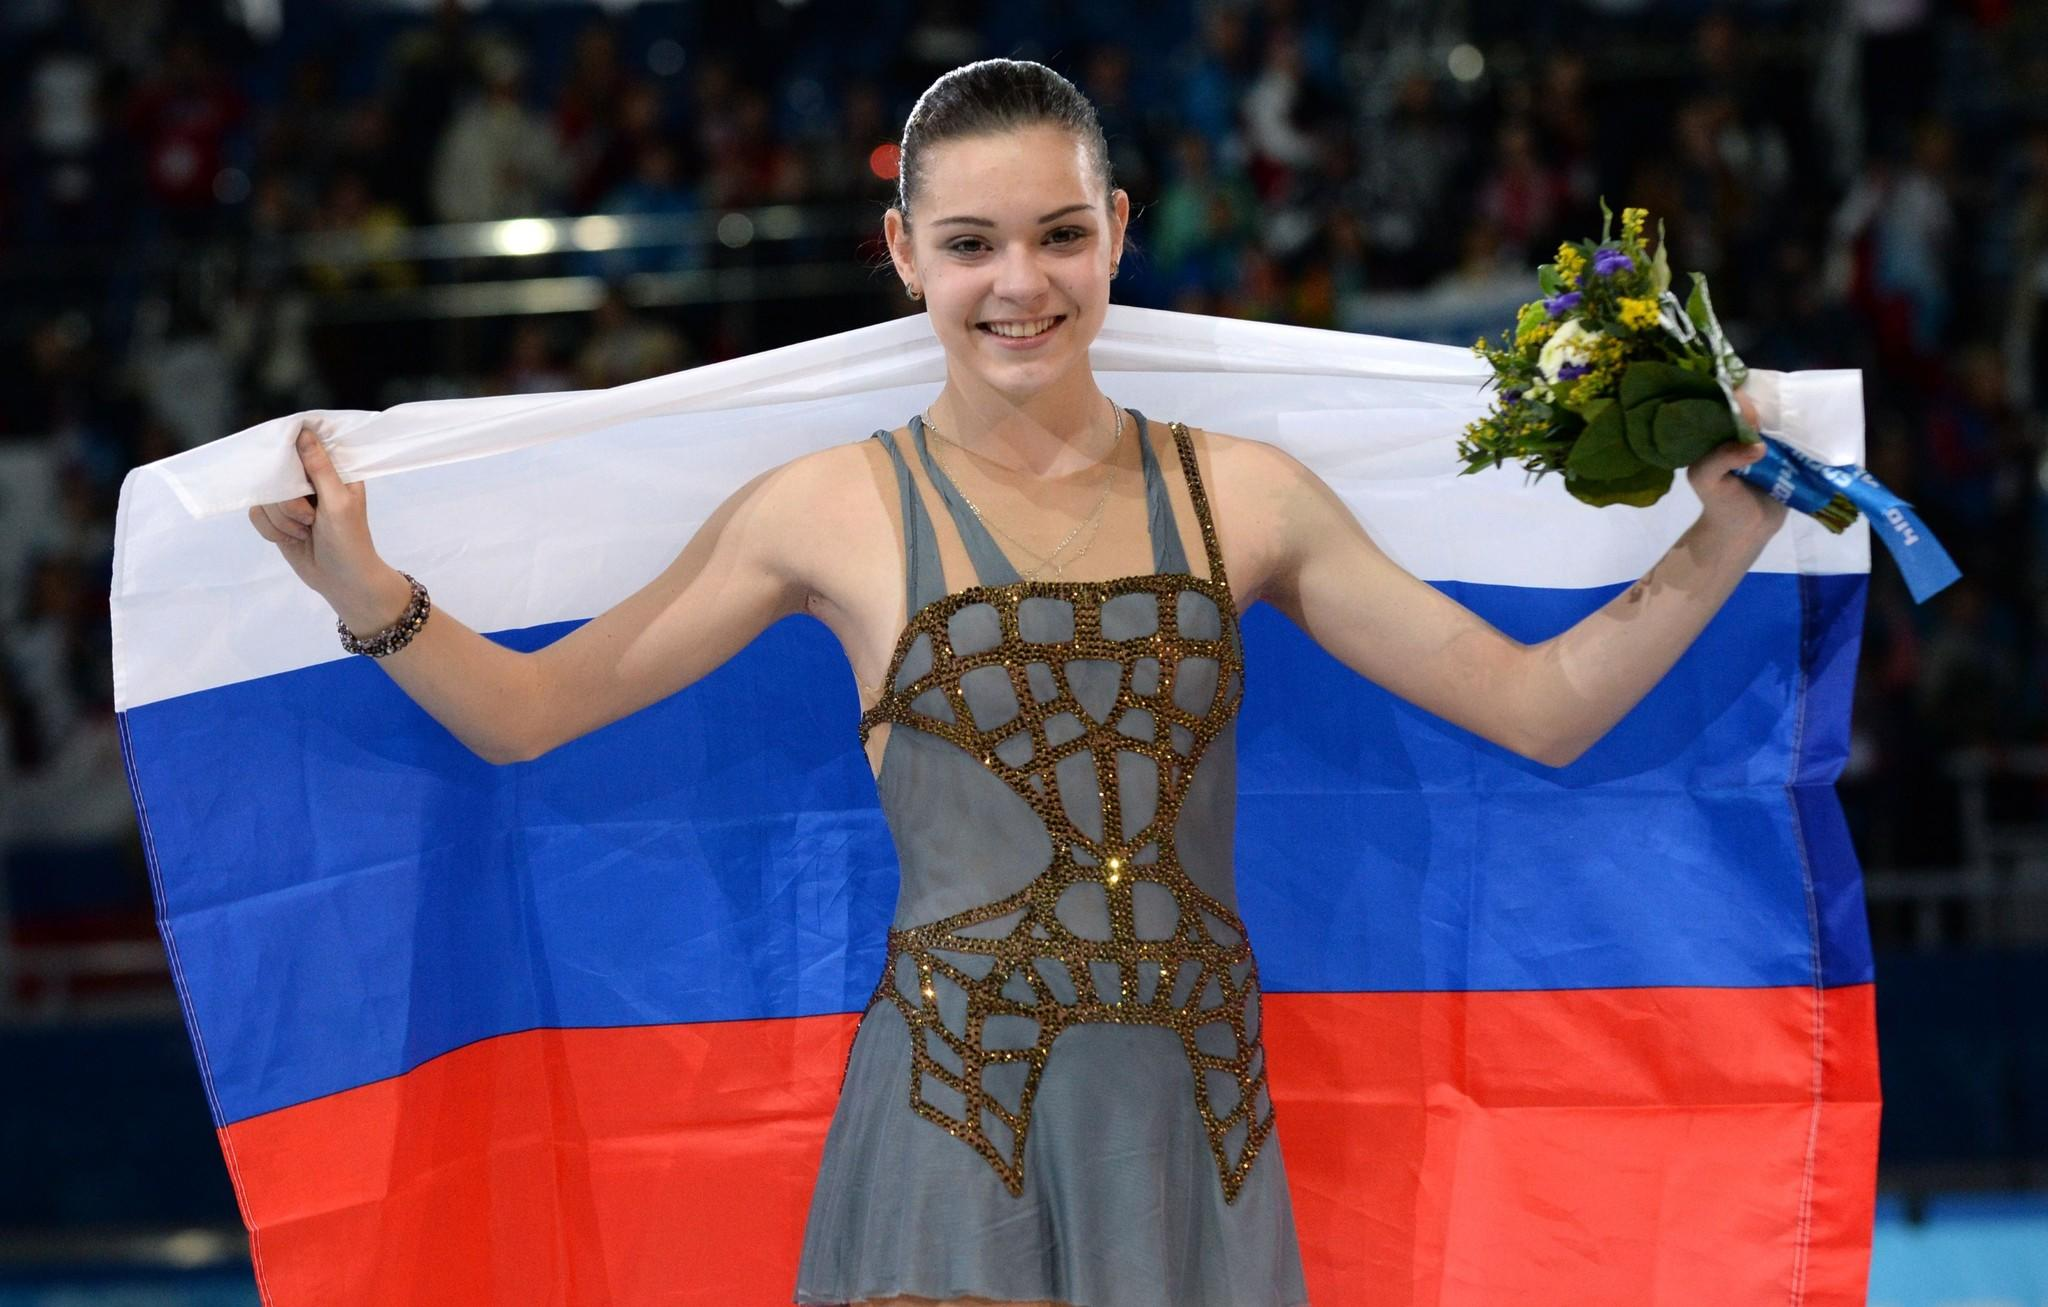 Russia's gold medalist Adelina Sotnikova celebrates Thursday.